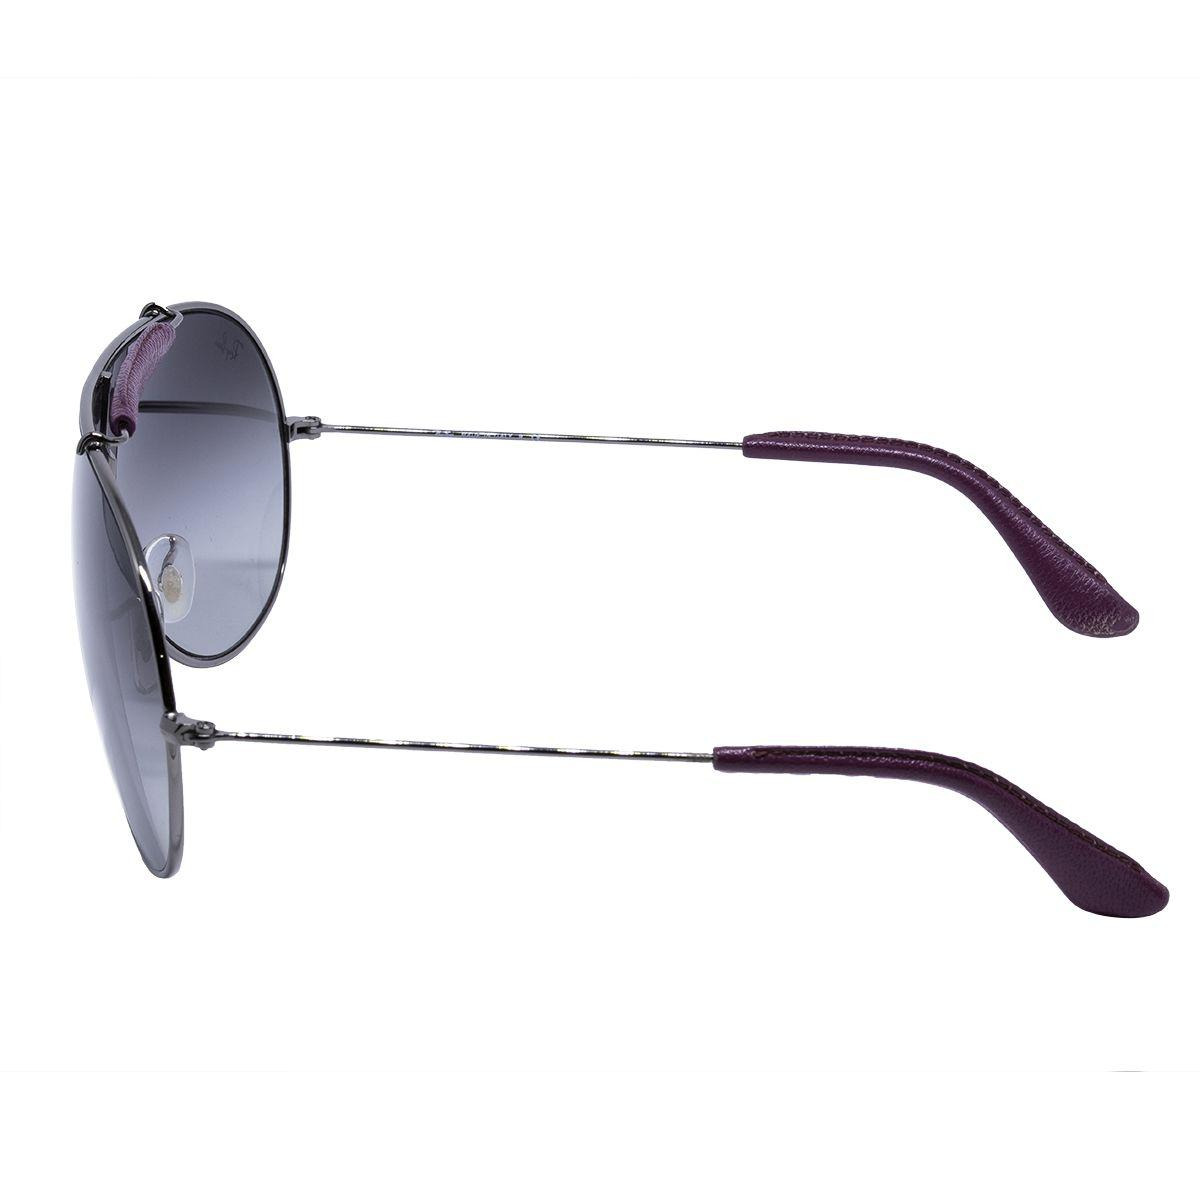 Óculos de Sol Ray Ban Máscara RB3416 - Metal Prata, Lente Cinza Degradê R   657,00 à vista. Adicionar à sacola 81c08213e0